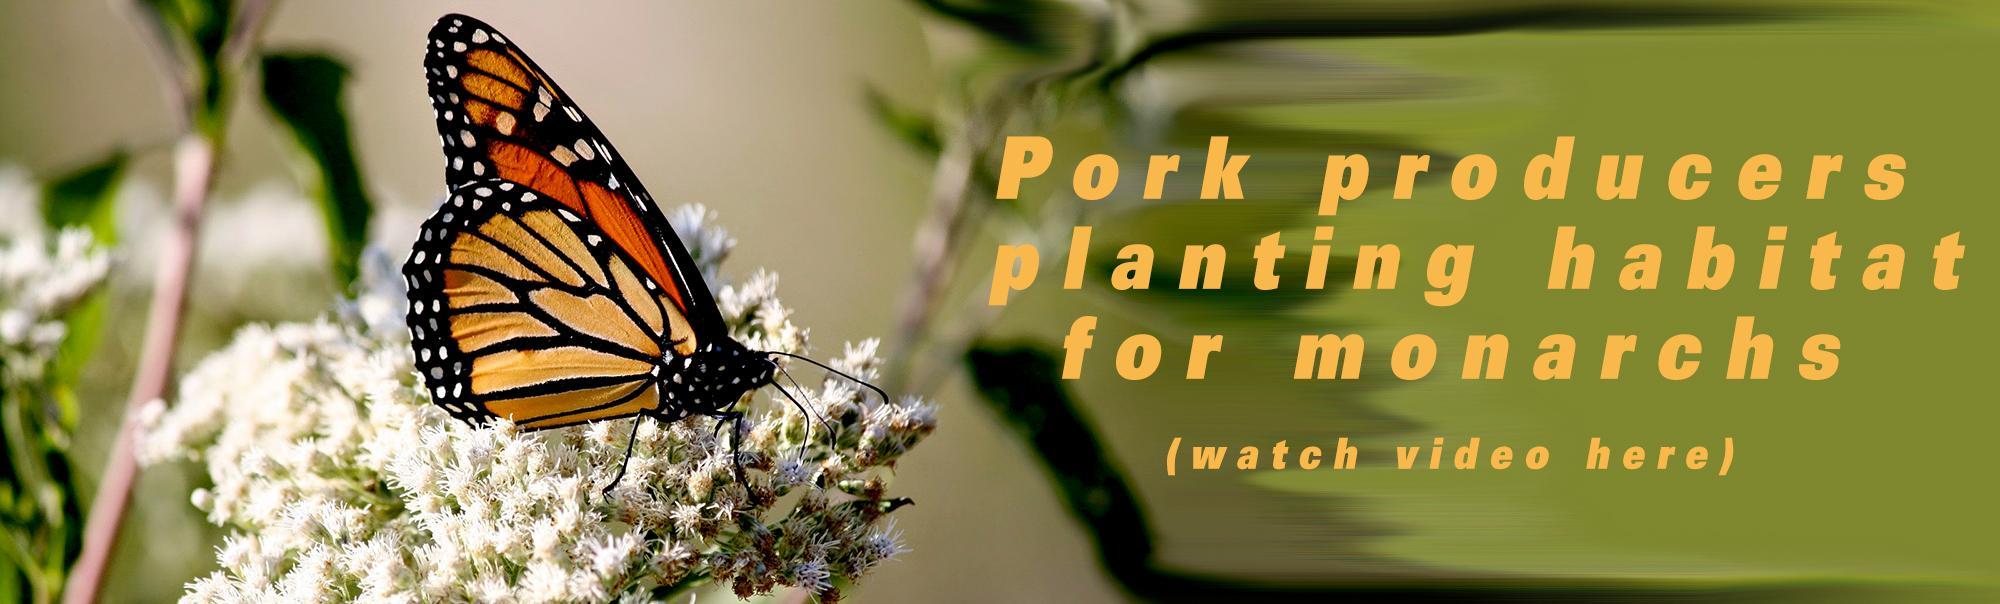 Pork producers planting habitat for monarchs